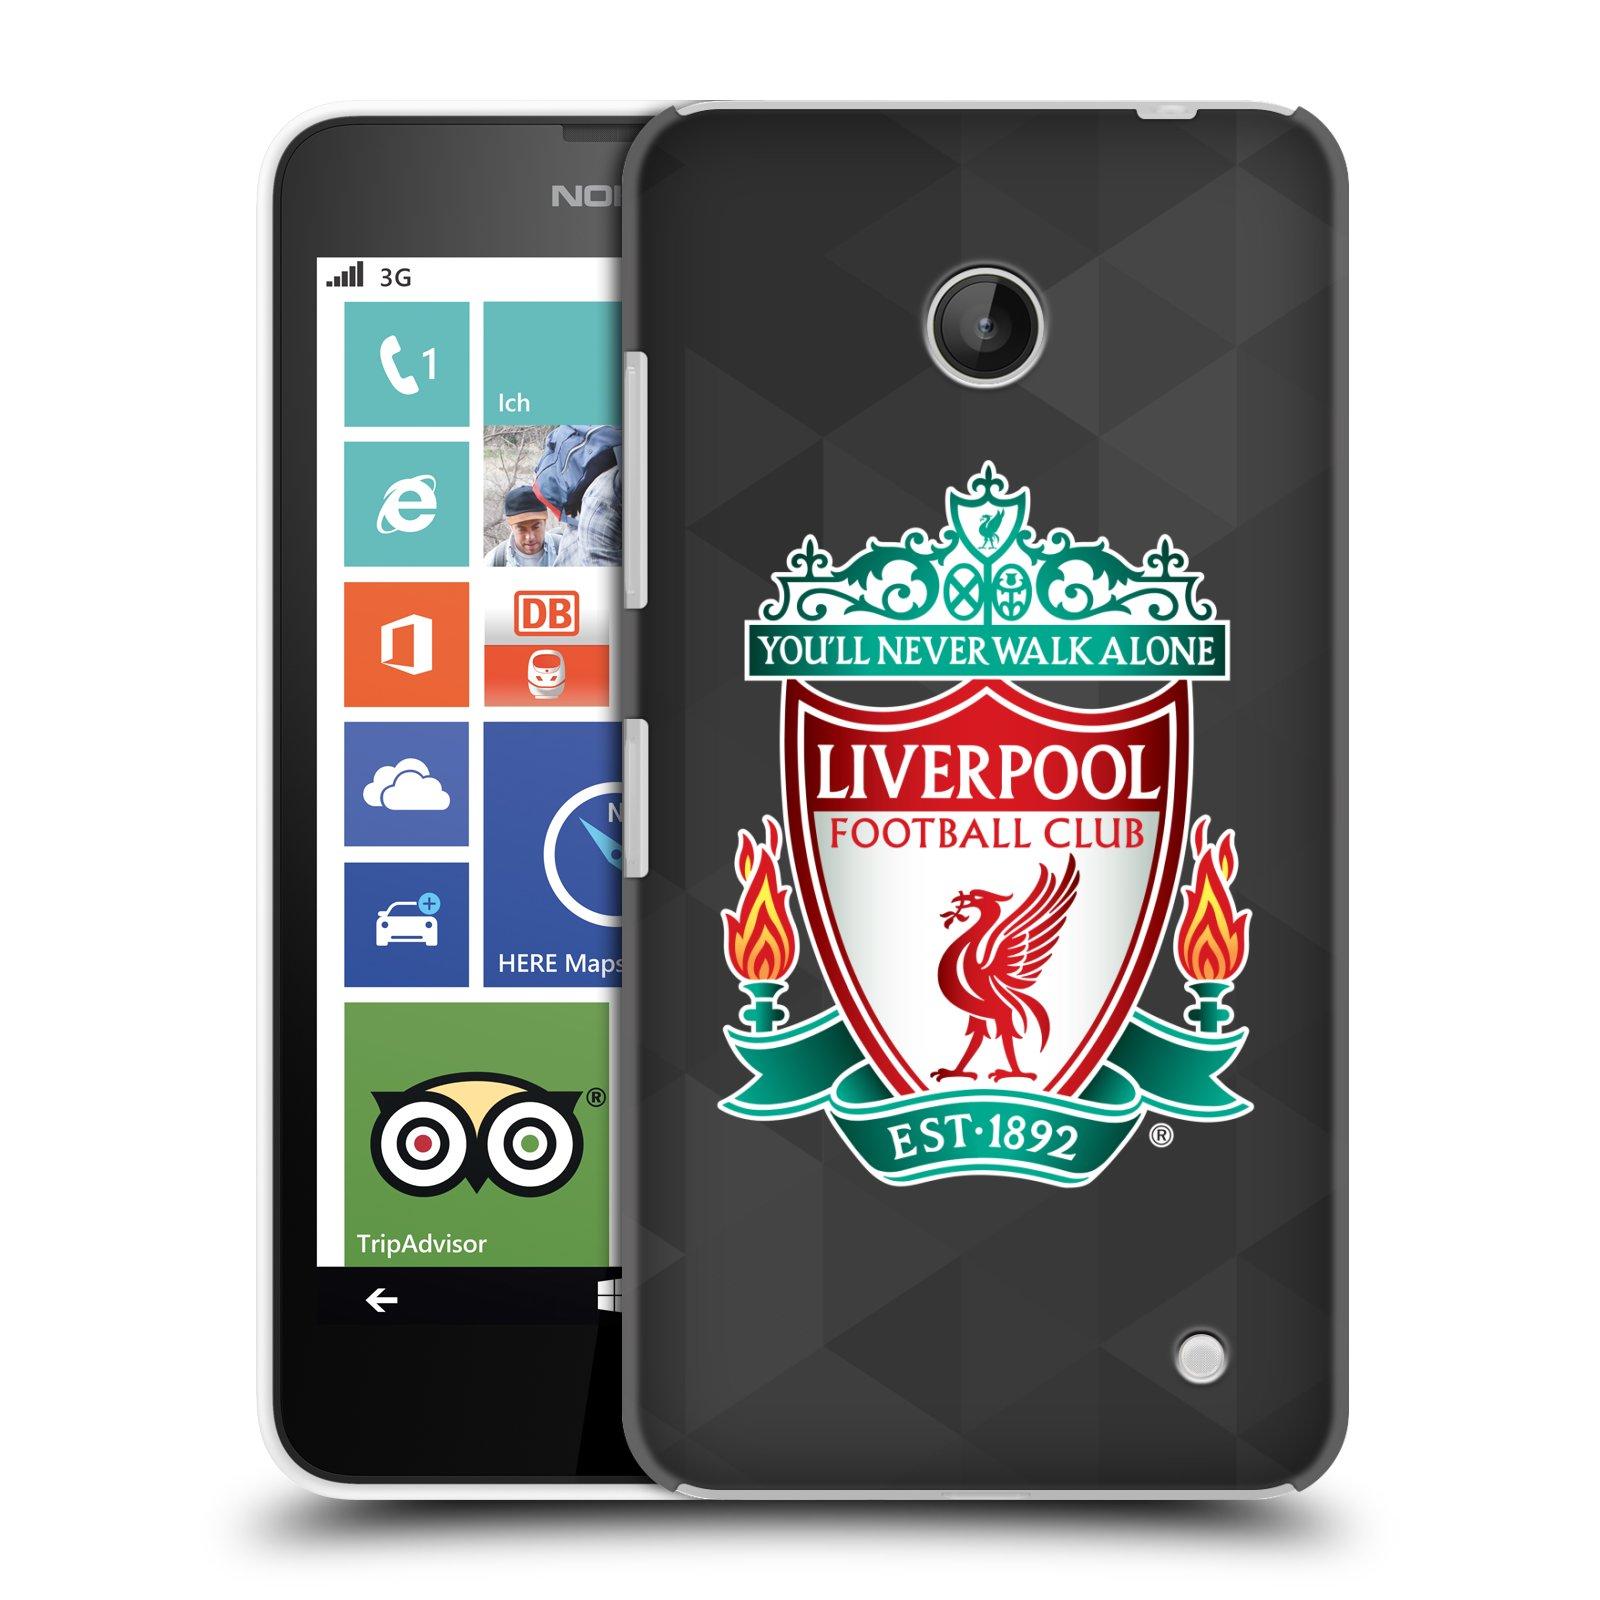 Plastové pouzdro na mobil Nokia Lumia 630 HEAD CASE ZNAK LIVERPOOL FC OFFICIAL GEOMETRIC BLACK (Kryt či obal na mobilní telefon Liverpool FC Official pro Nokia Lumia 630 a Nokia Lumia 630 Dual SIM)